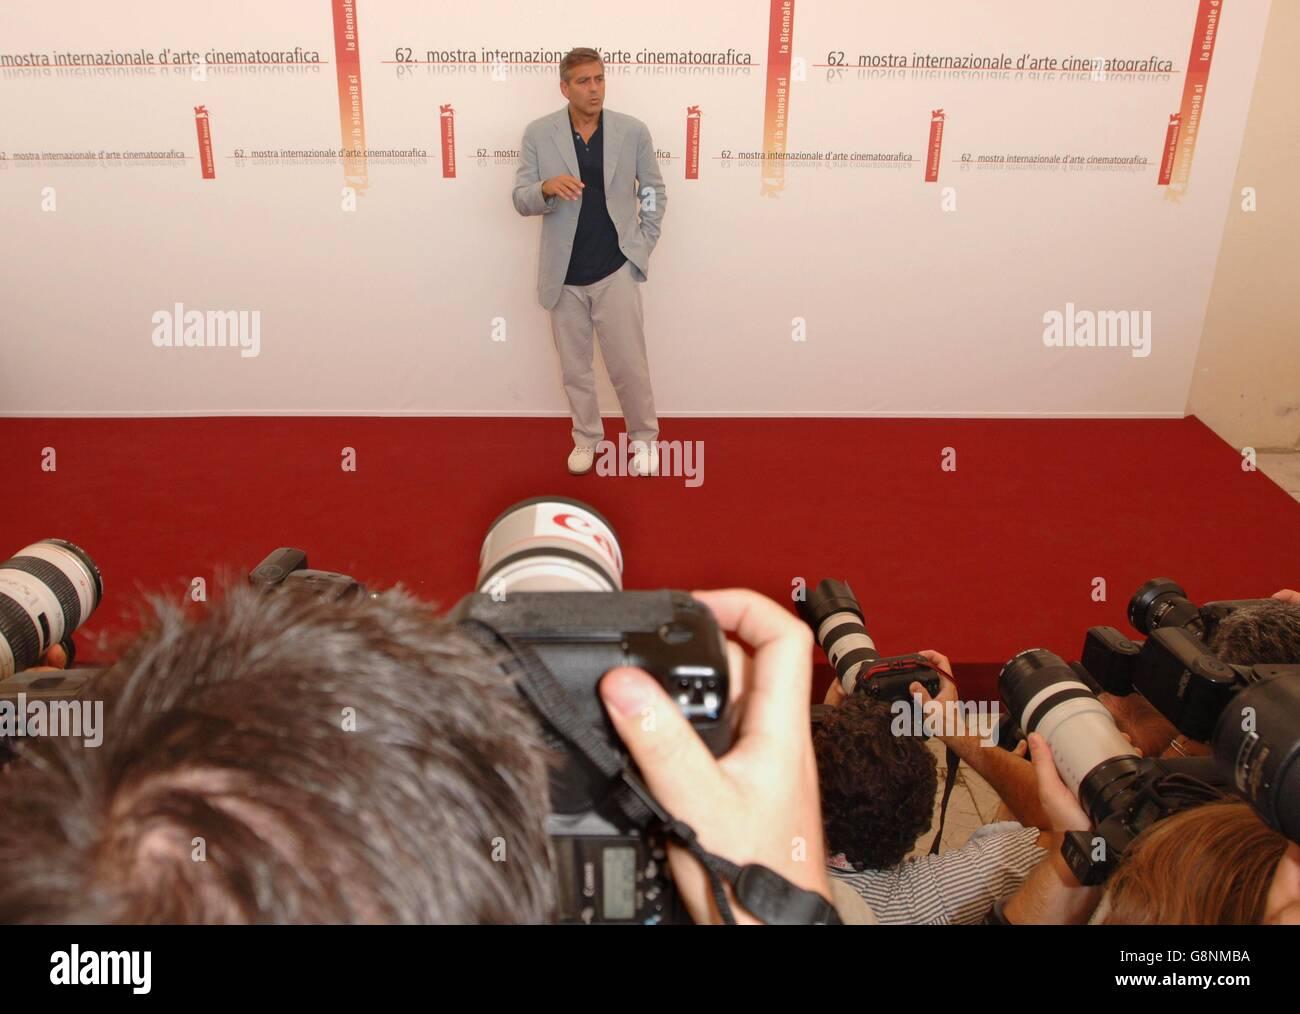 62nd Venice Film Festival - Stock Image